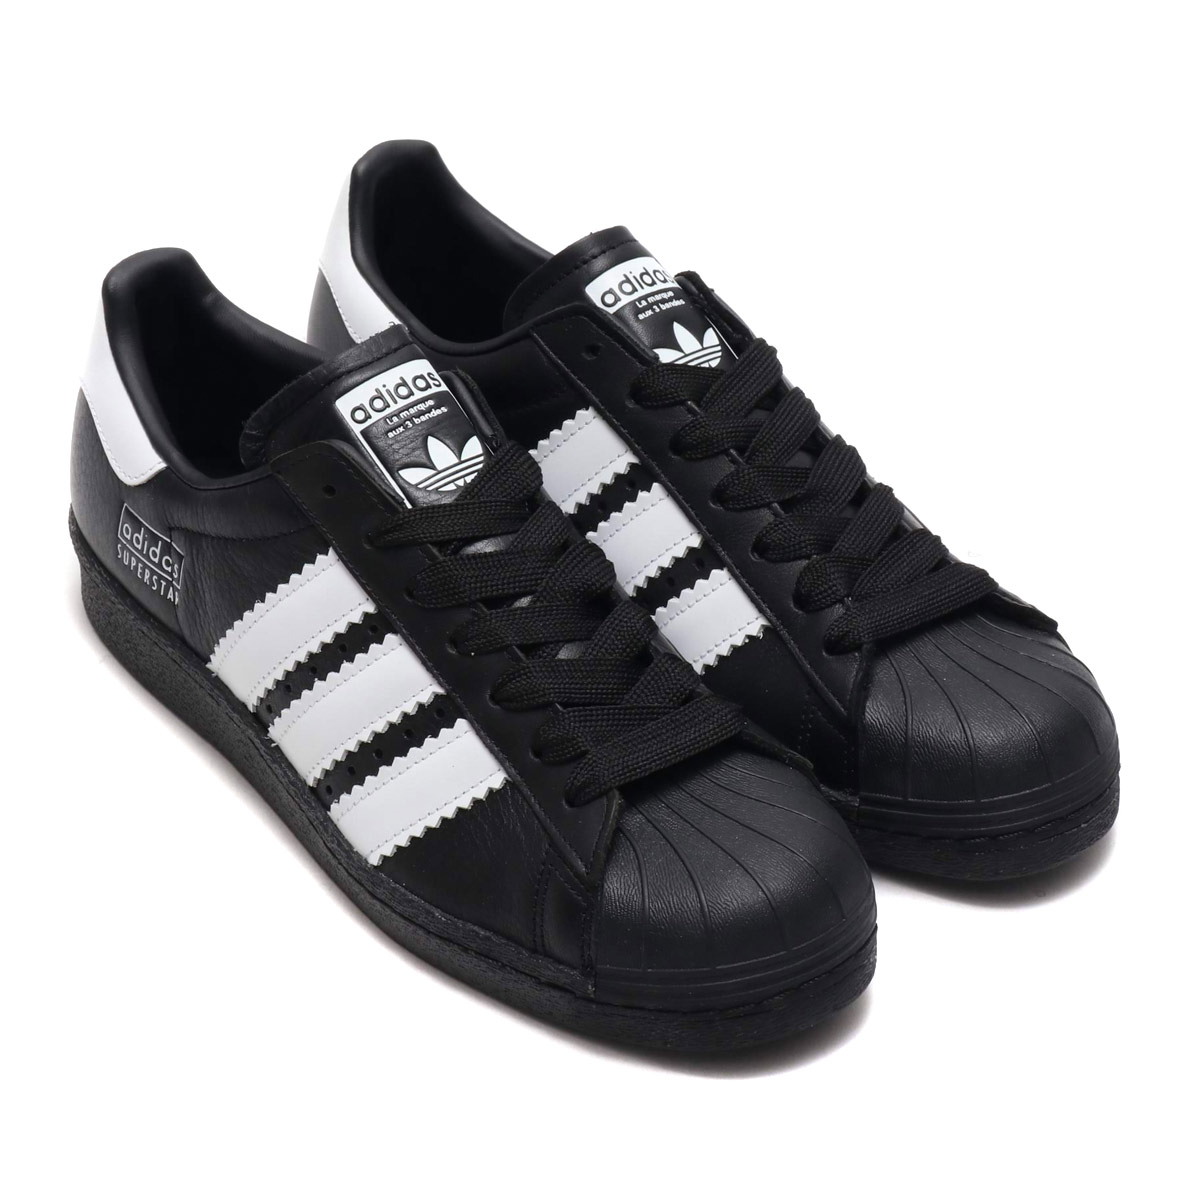 adidas Originals SUPERSTAR 80s (アディダスオリジナルス スーパースター 80s)CORE BLACK/RUNNING WHITE/CORE BLACK【メンズ レディース スニーカー】19SS-I